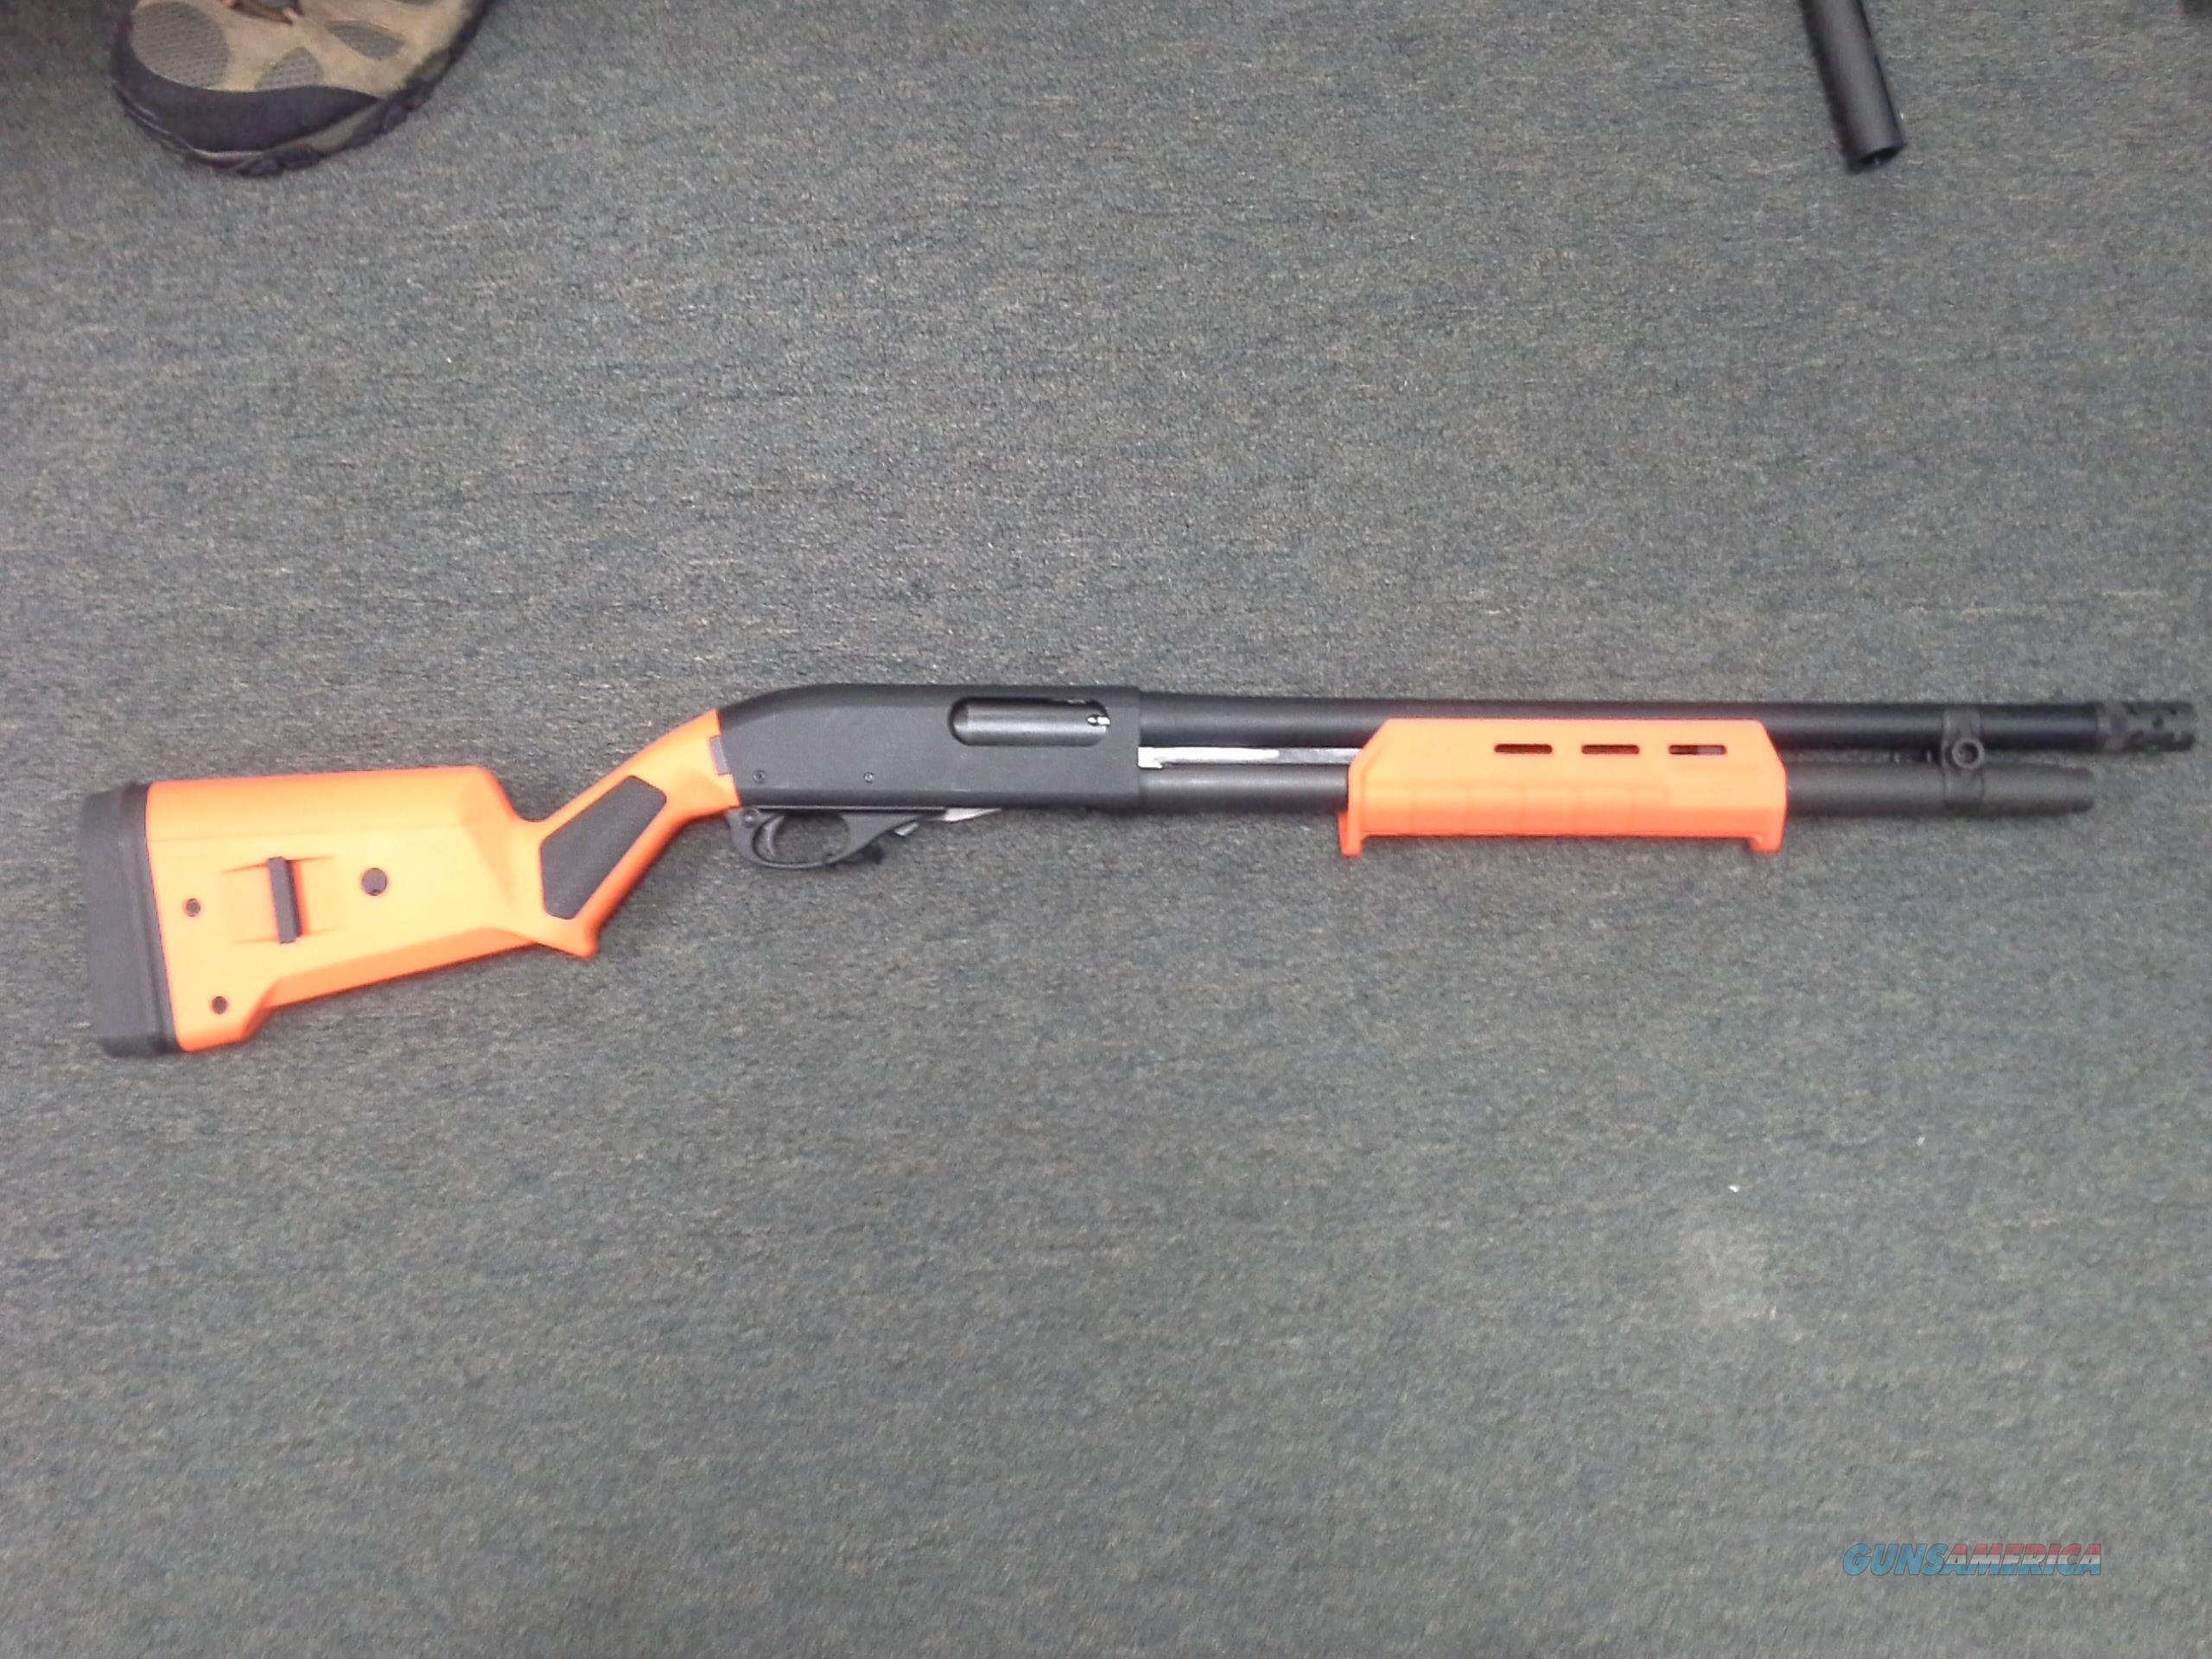 Discount Furniture Lakeland Fl Custom remington 870 Guns > Shotguns > Remington Shotguns > Pump ...